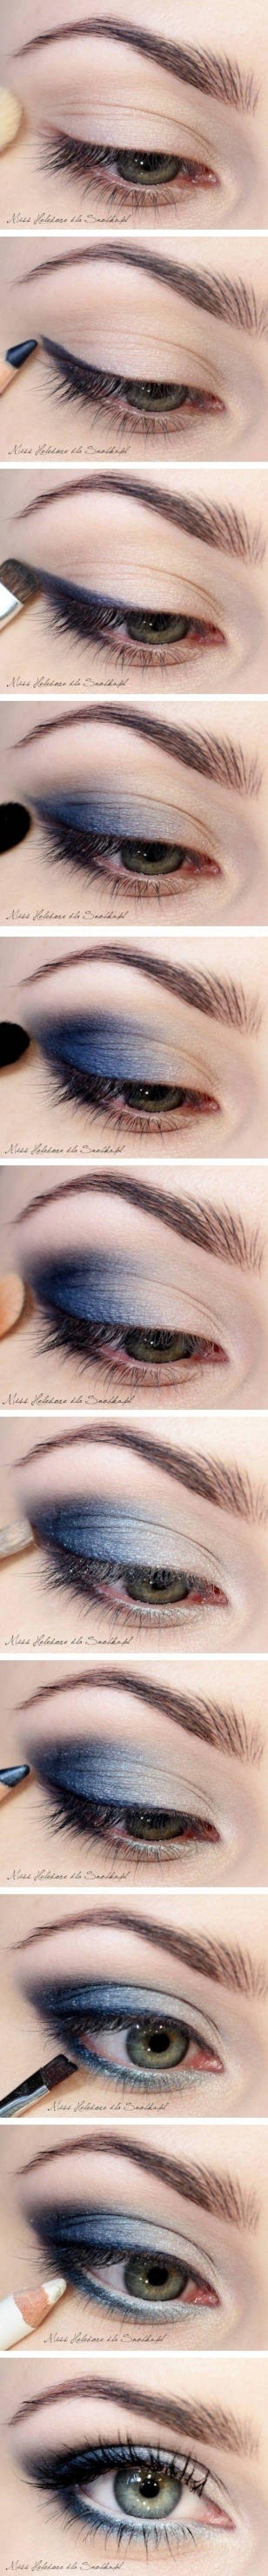 Blue smokey eye technique